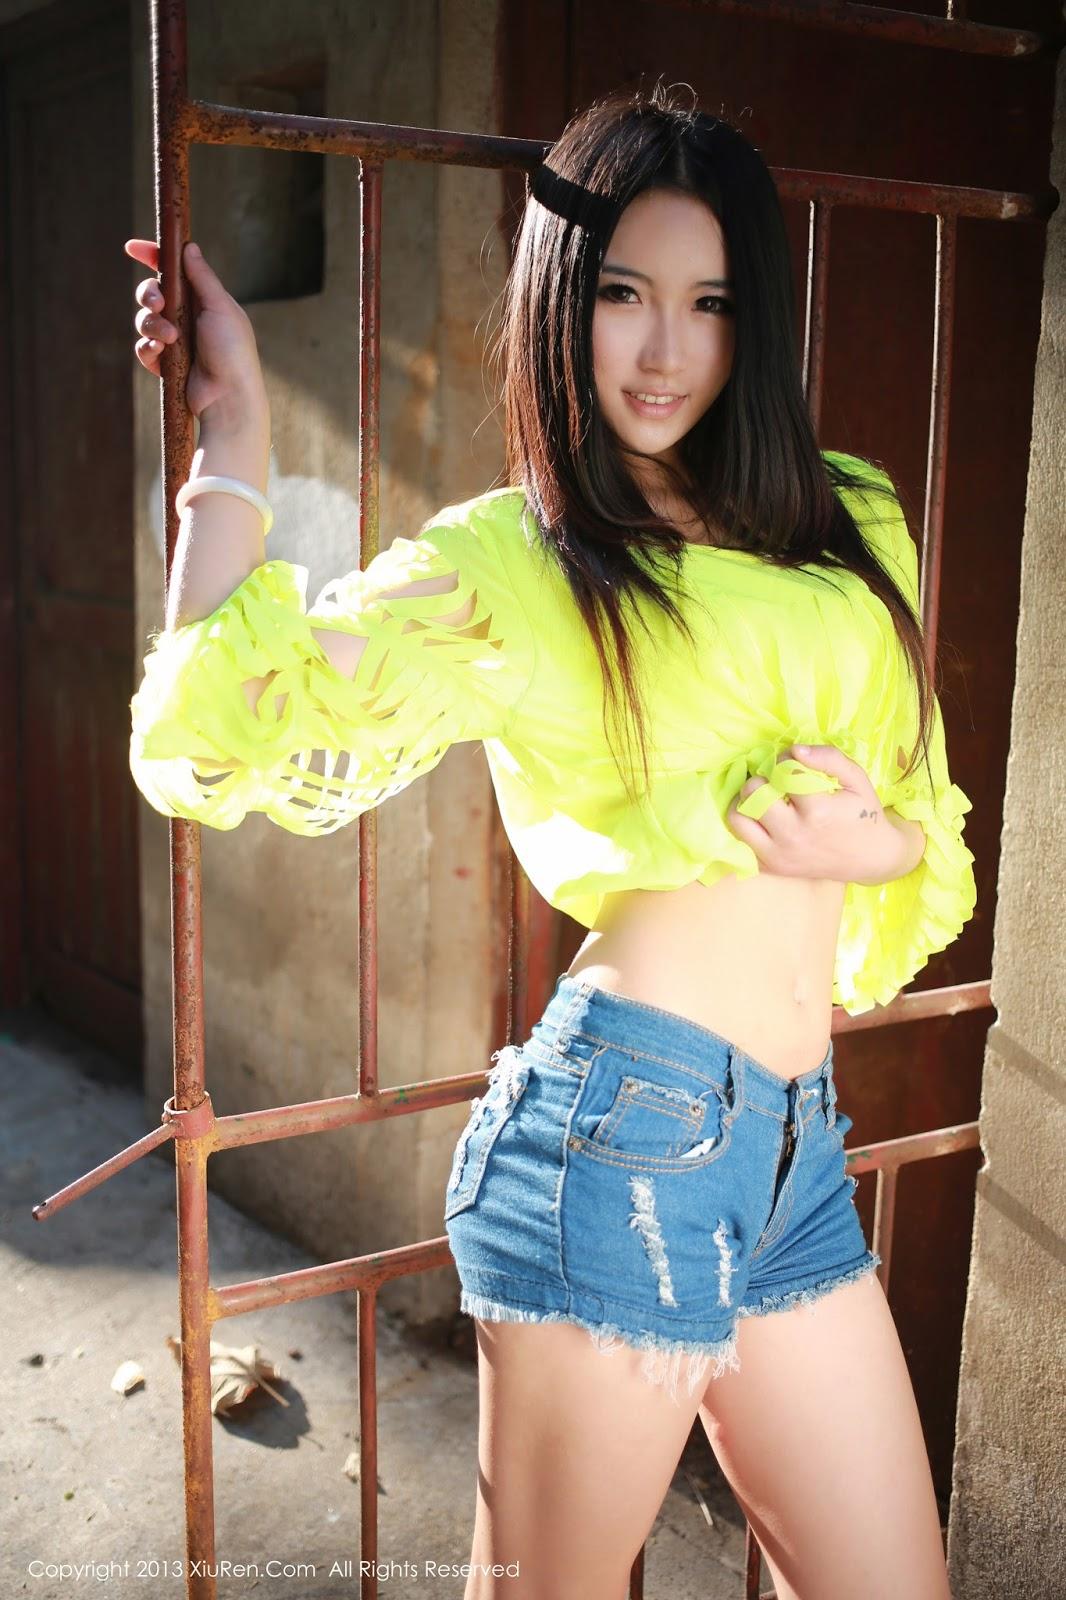 Xiuren - Vol.017 (81 pics) - Page 4 of 4 - Asian Beauty Image